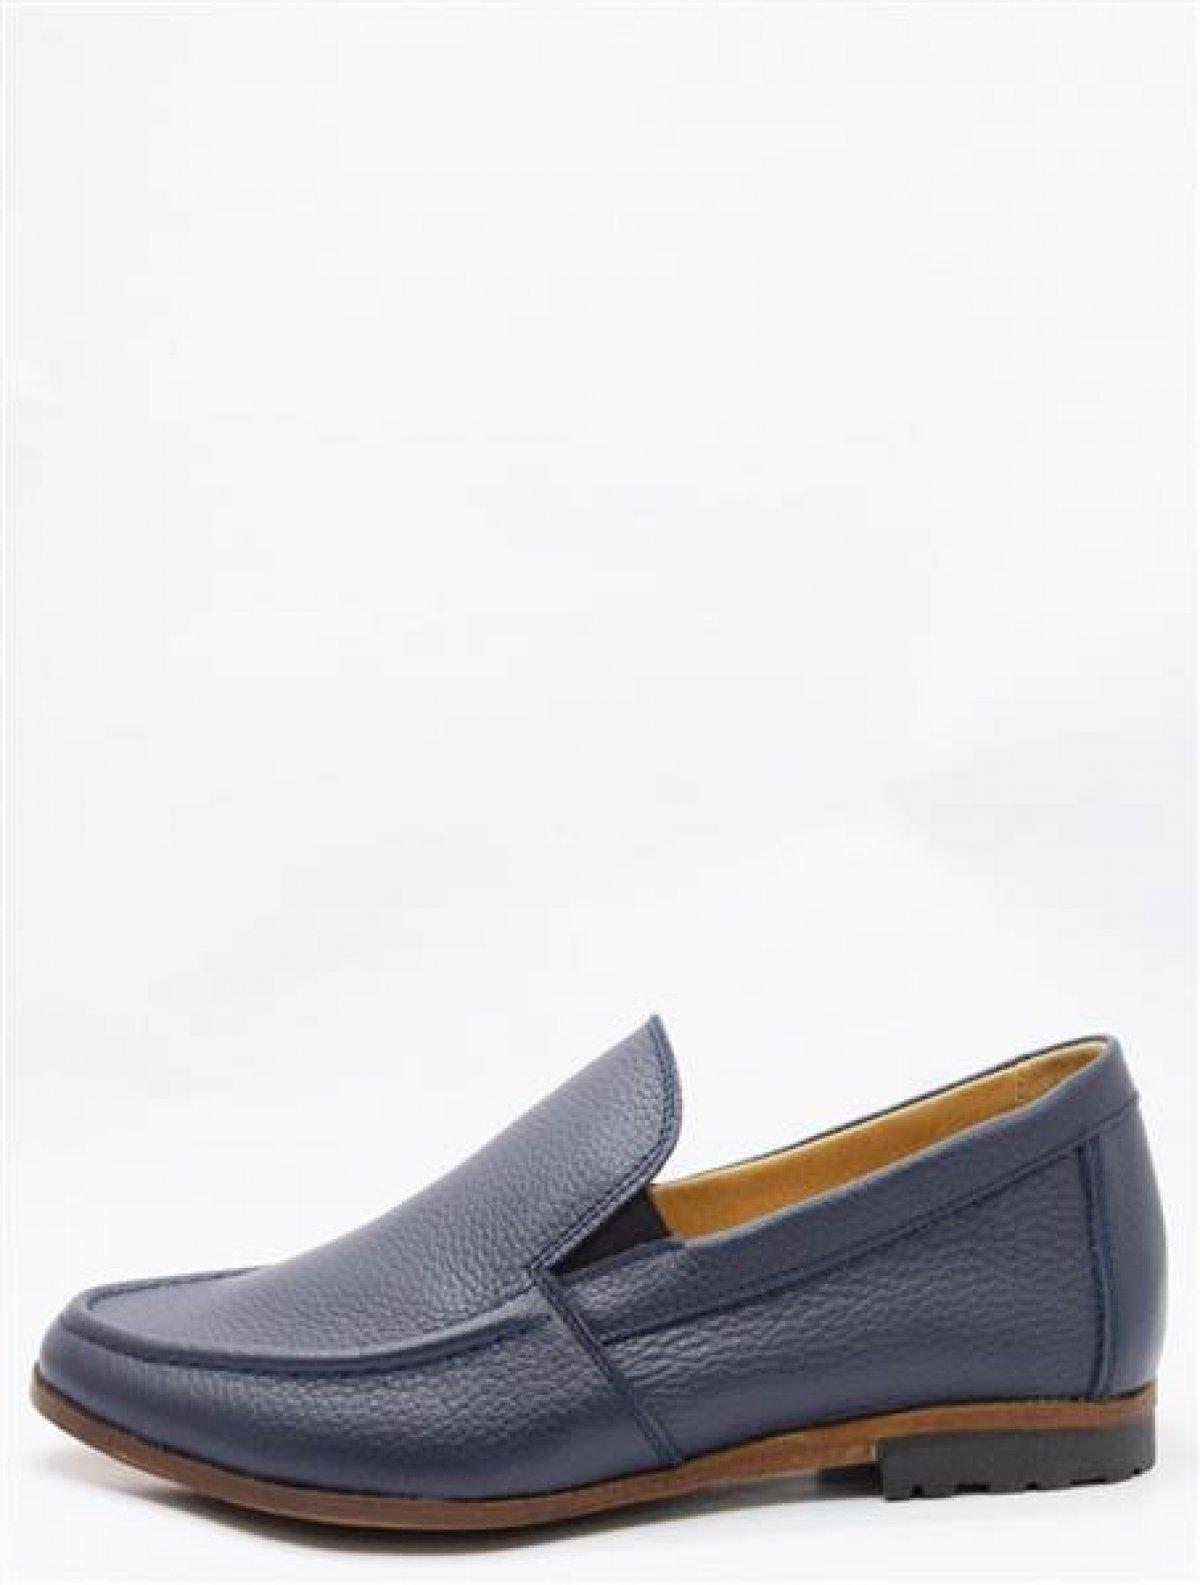 TerraiMpossa 142003/27 мужские туфли